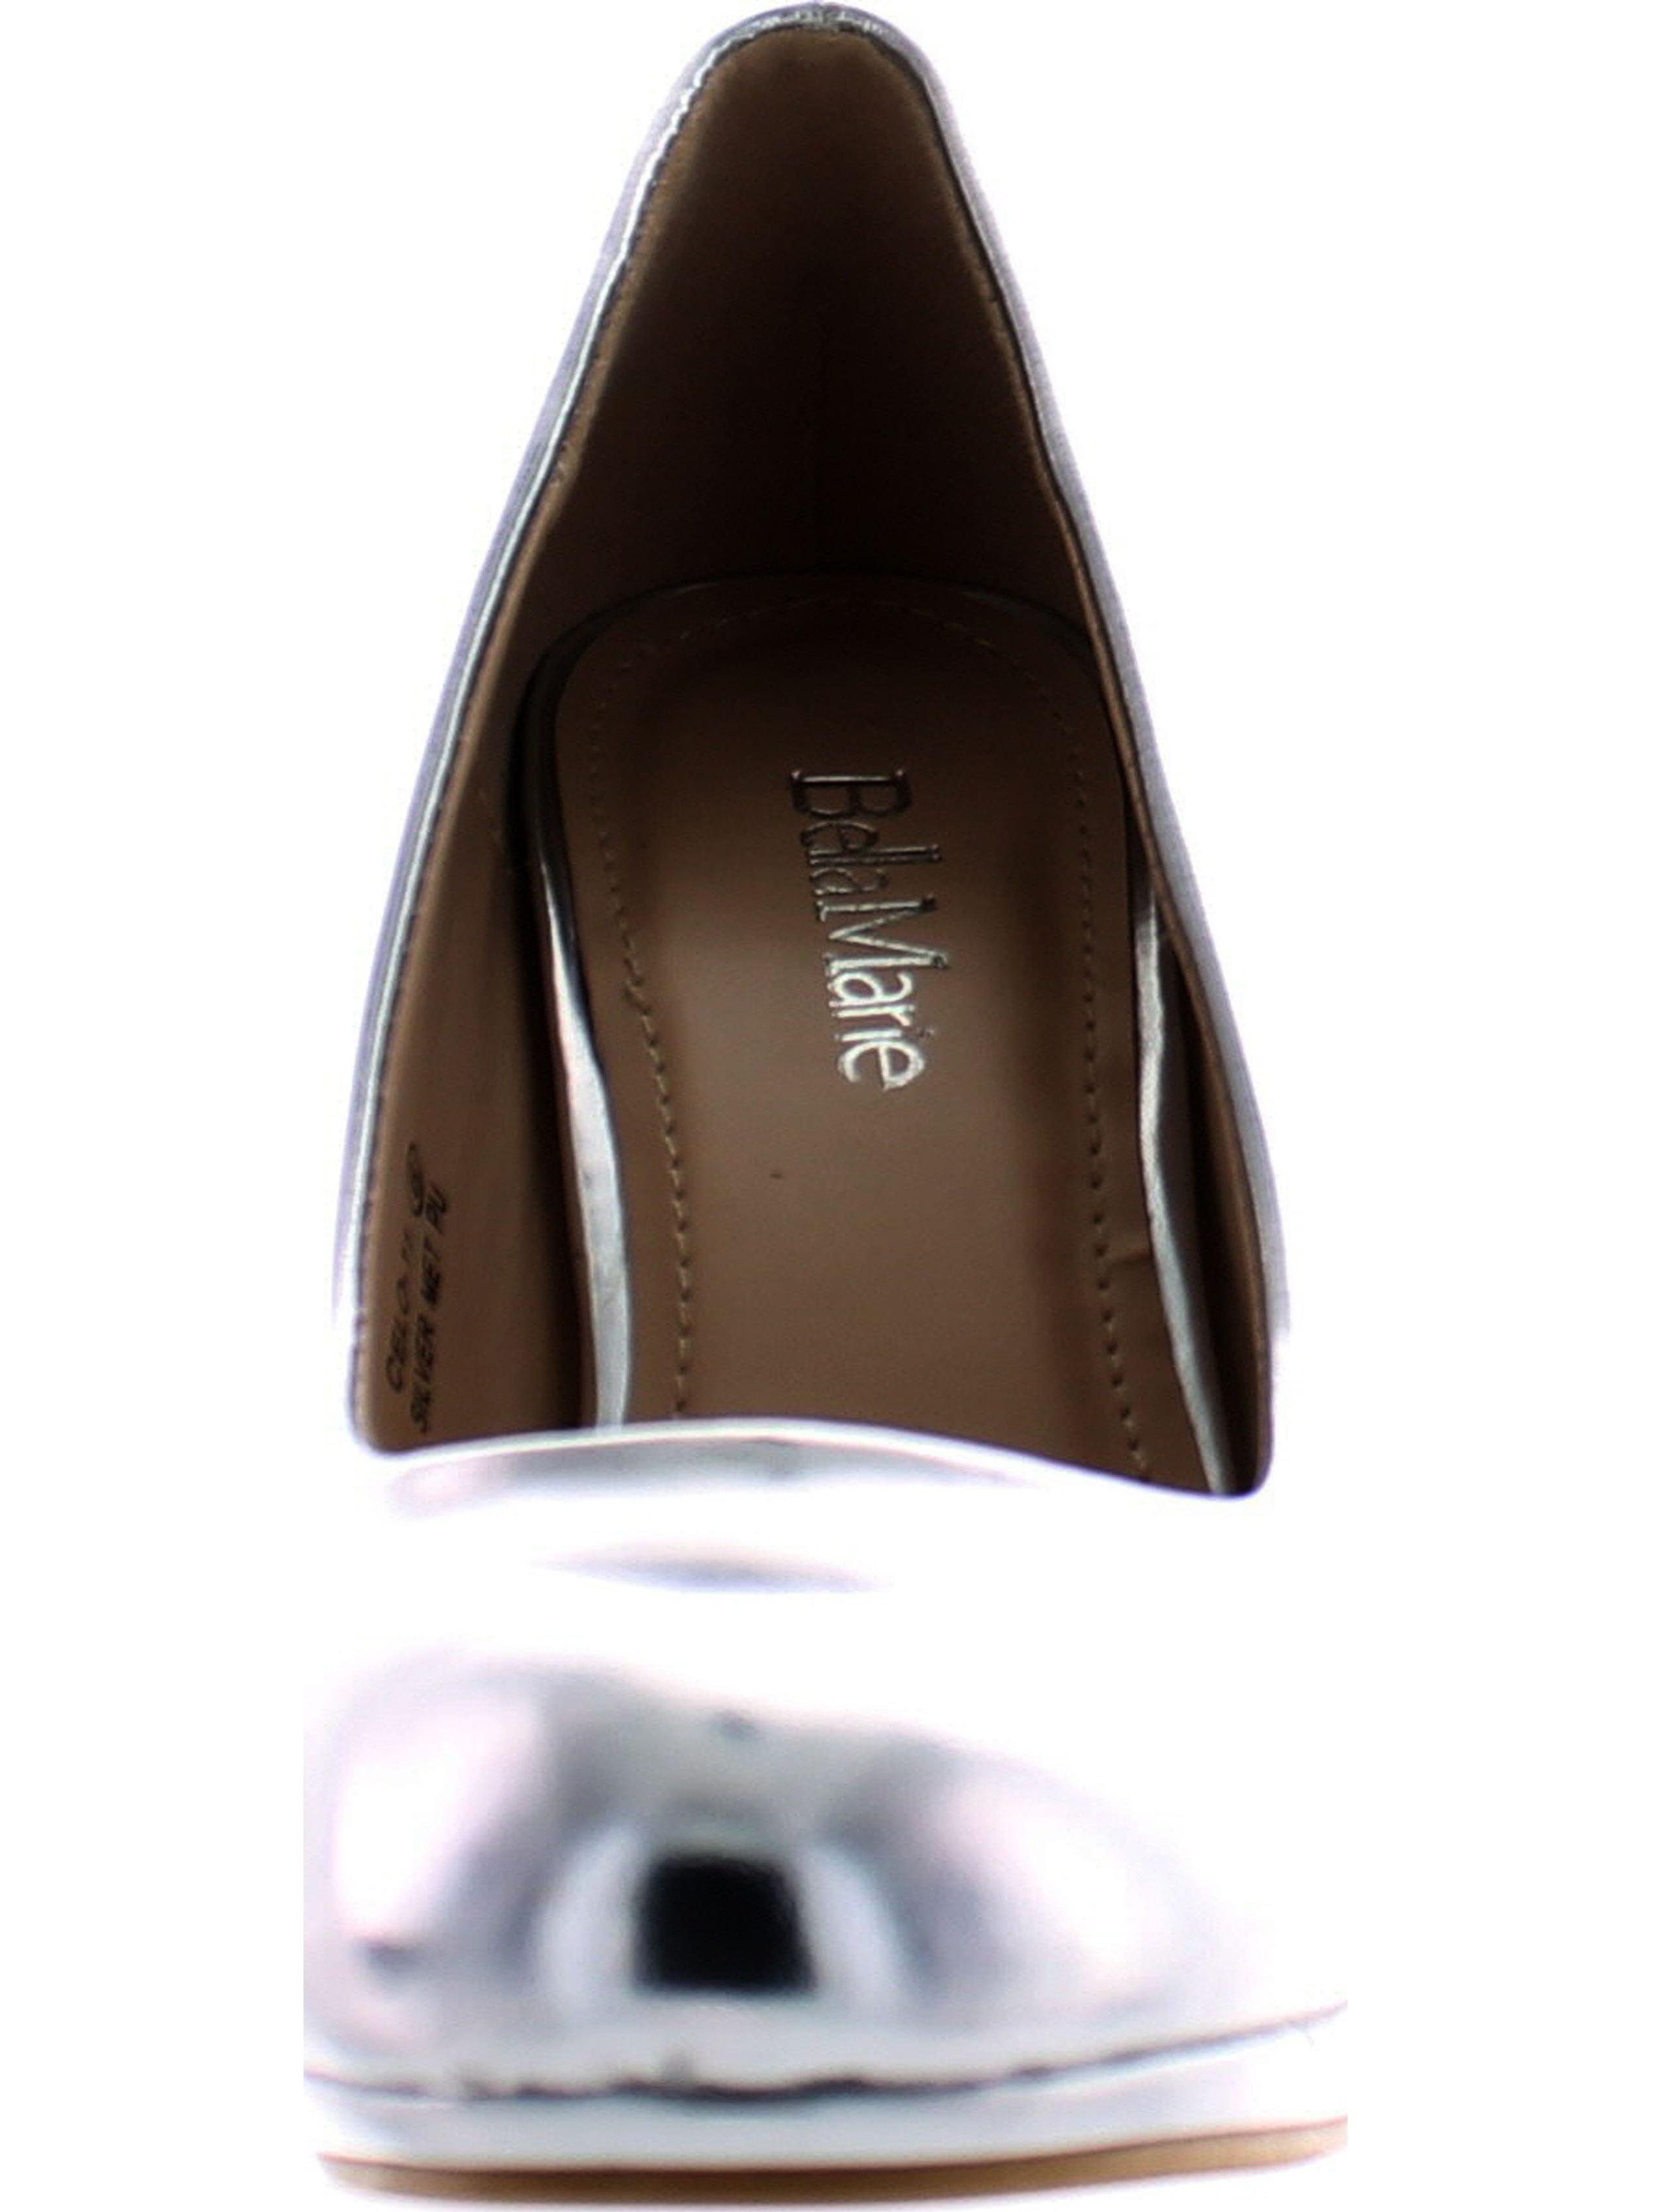 Bella Marie Celo-11 Women's almond toe platform multi color patent high heel stilettos shoes